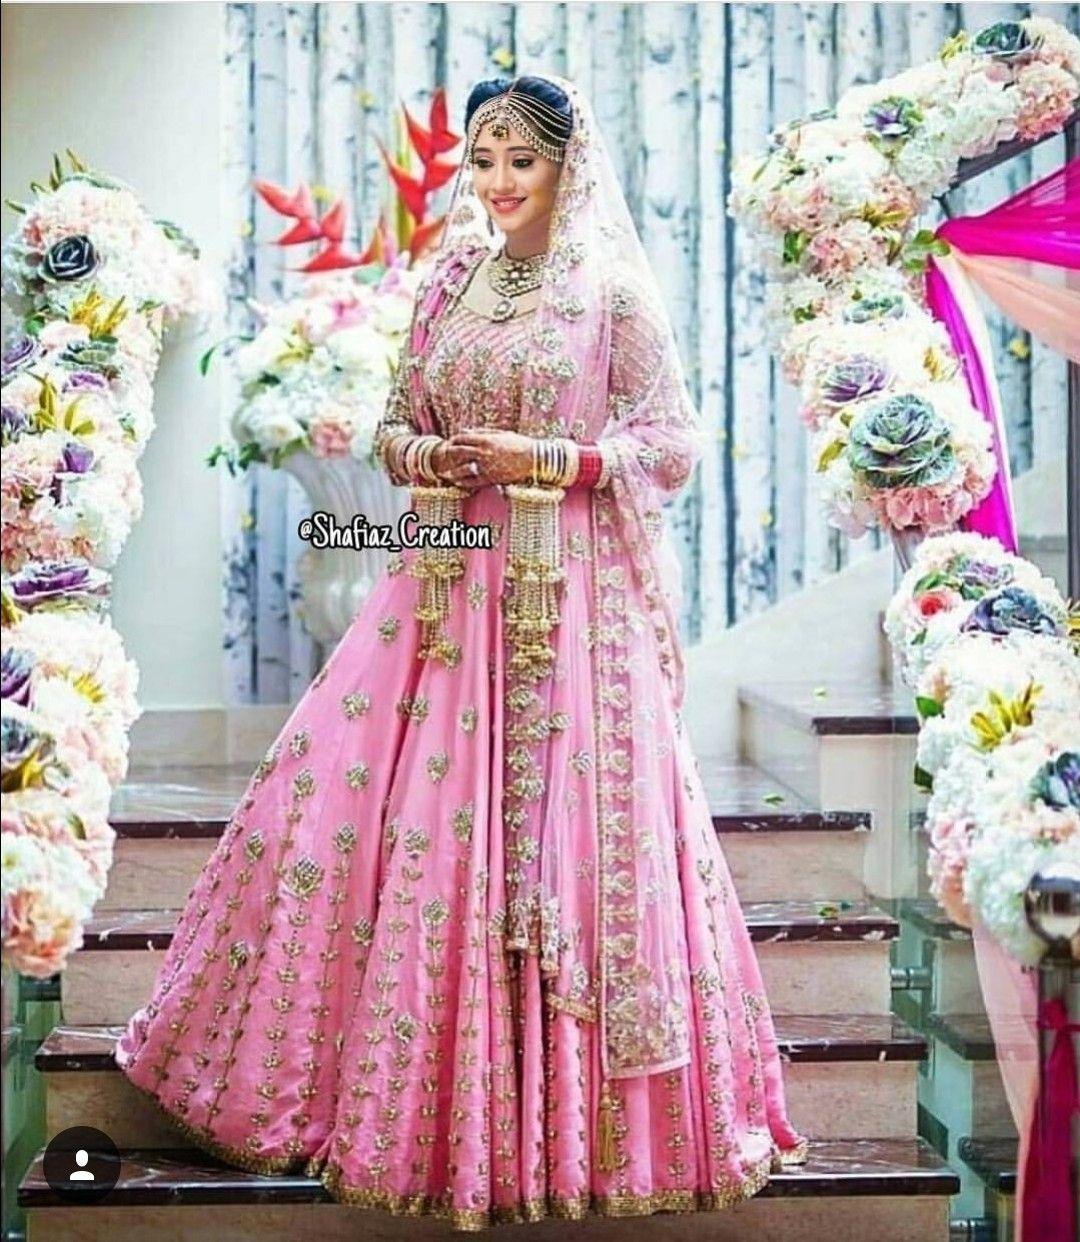 Pin de Madhu en Dresses & style | Pinterest